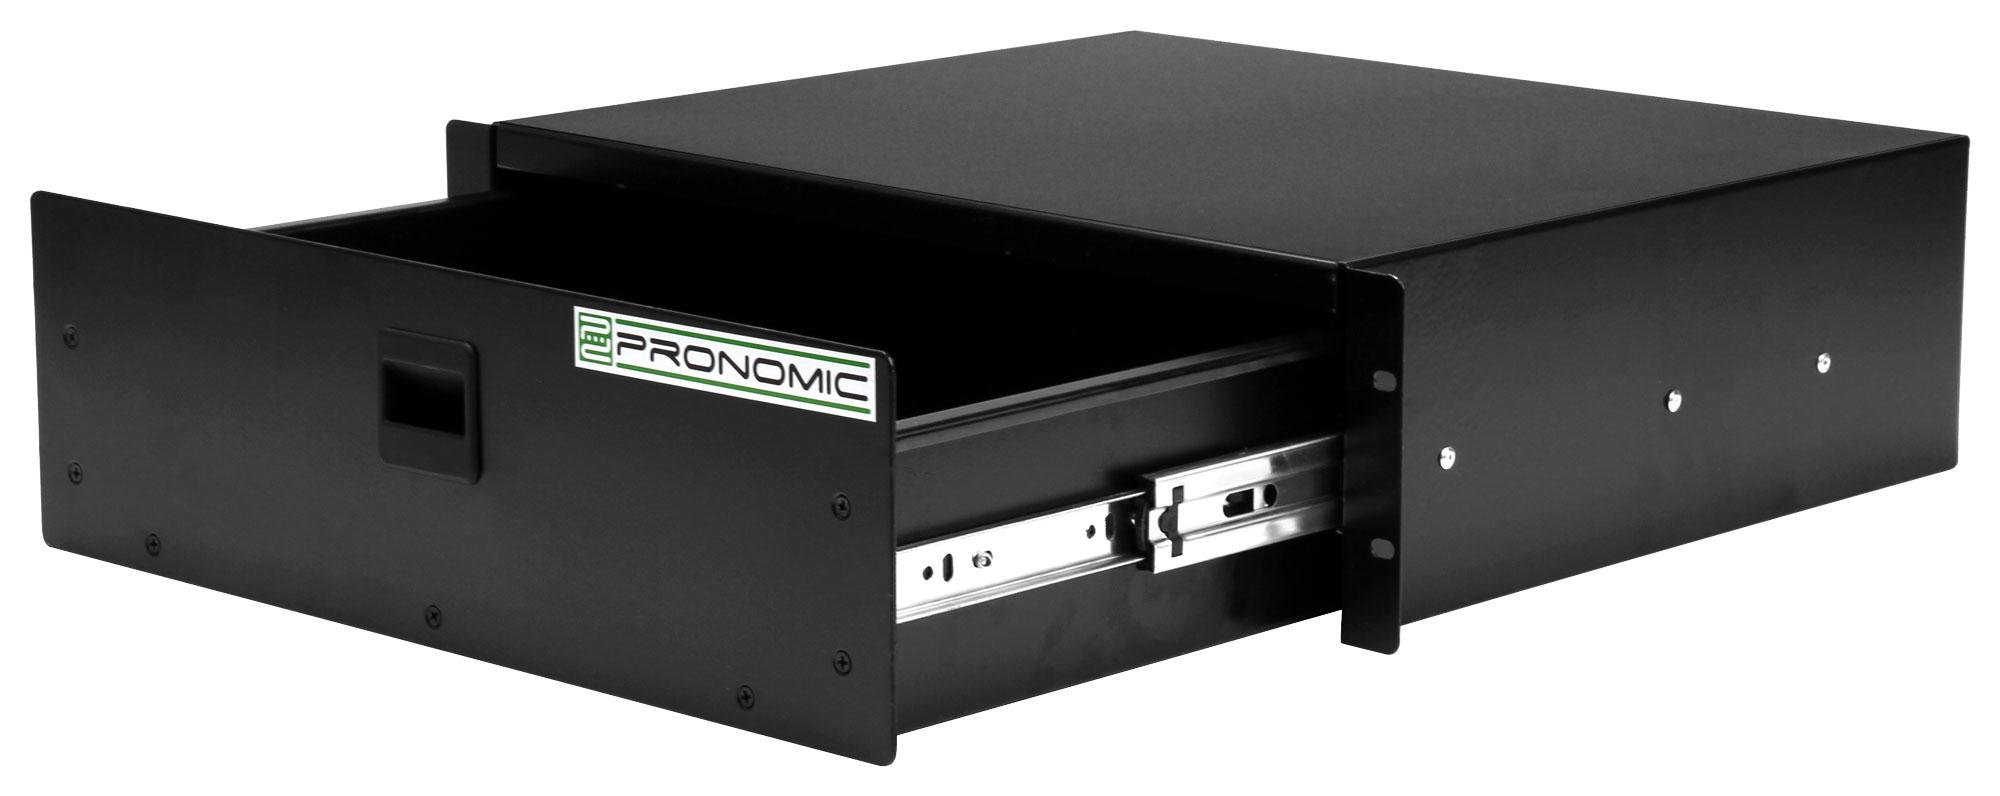 Pronomic RD 103 Rackschublade 3 HE